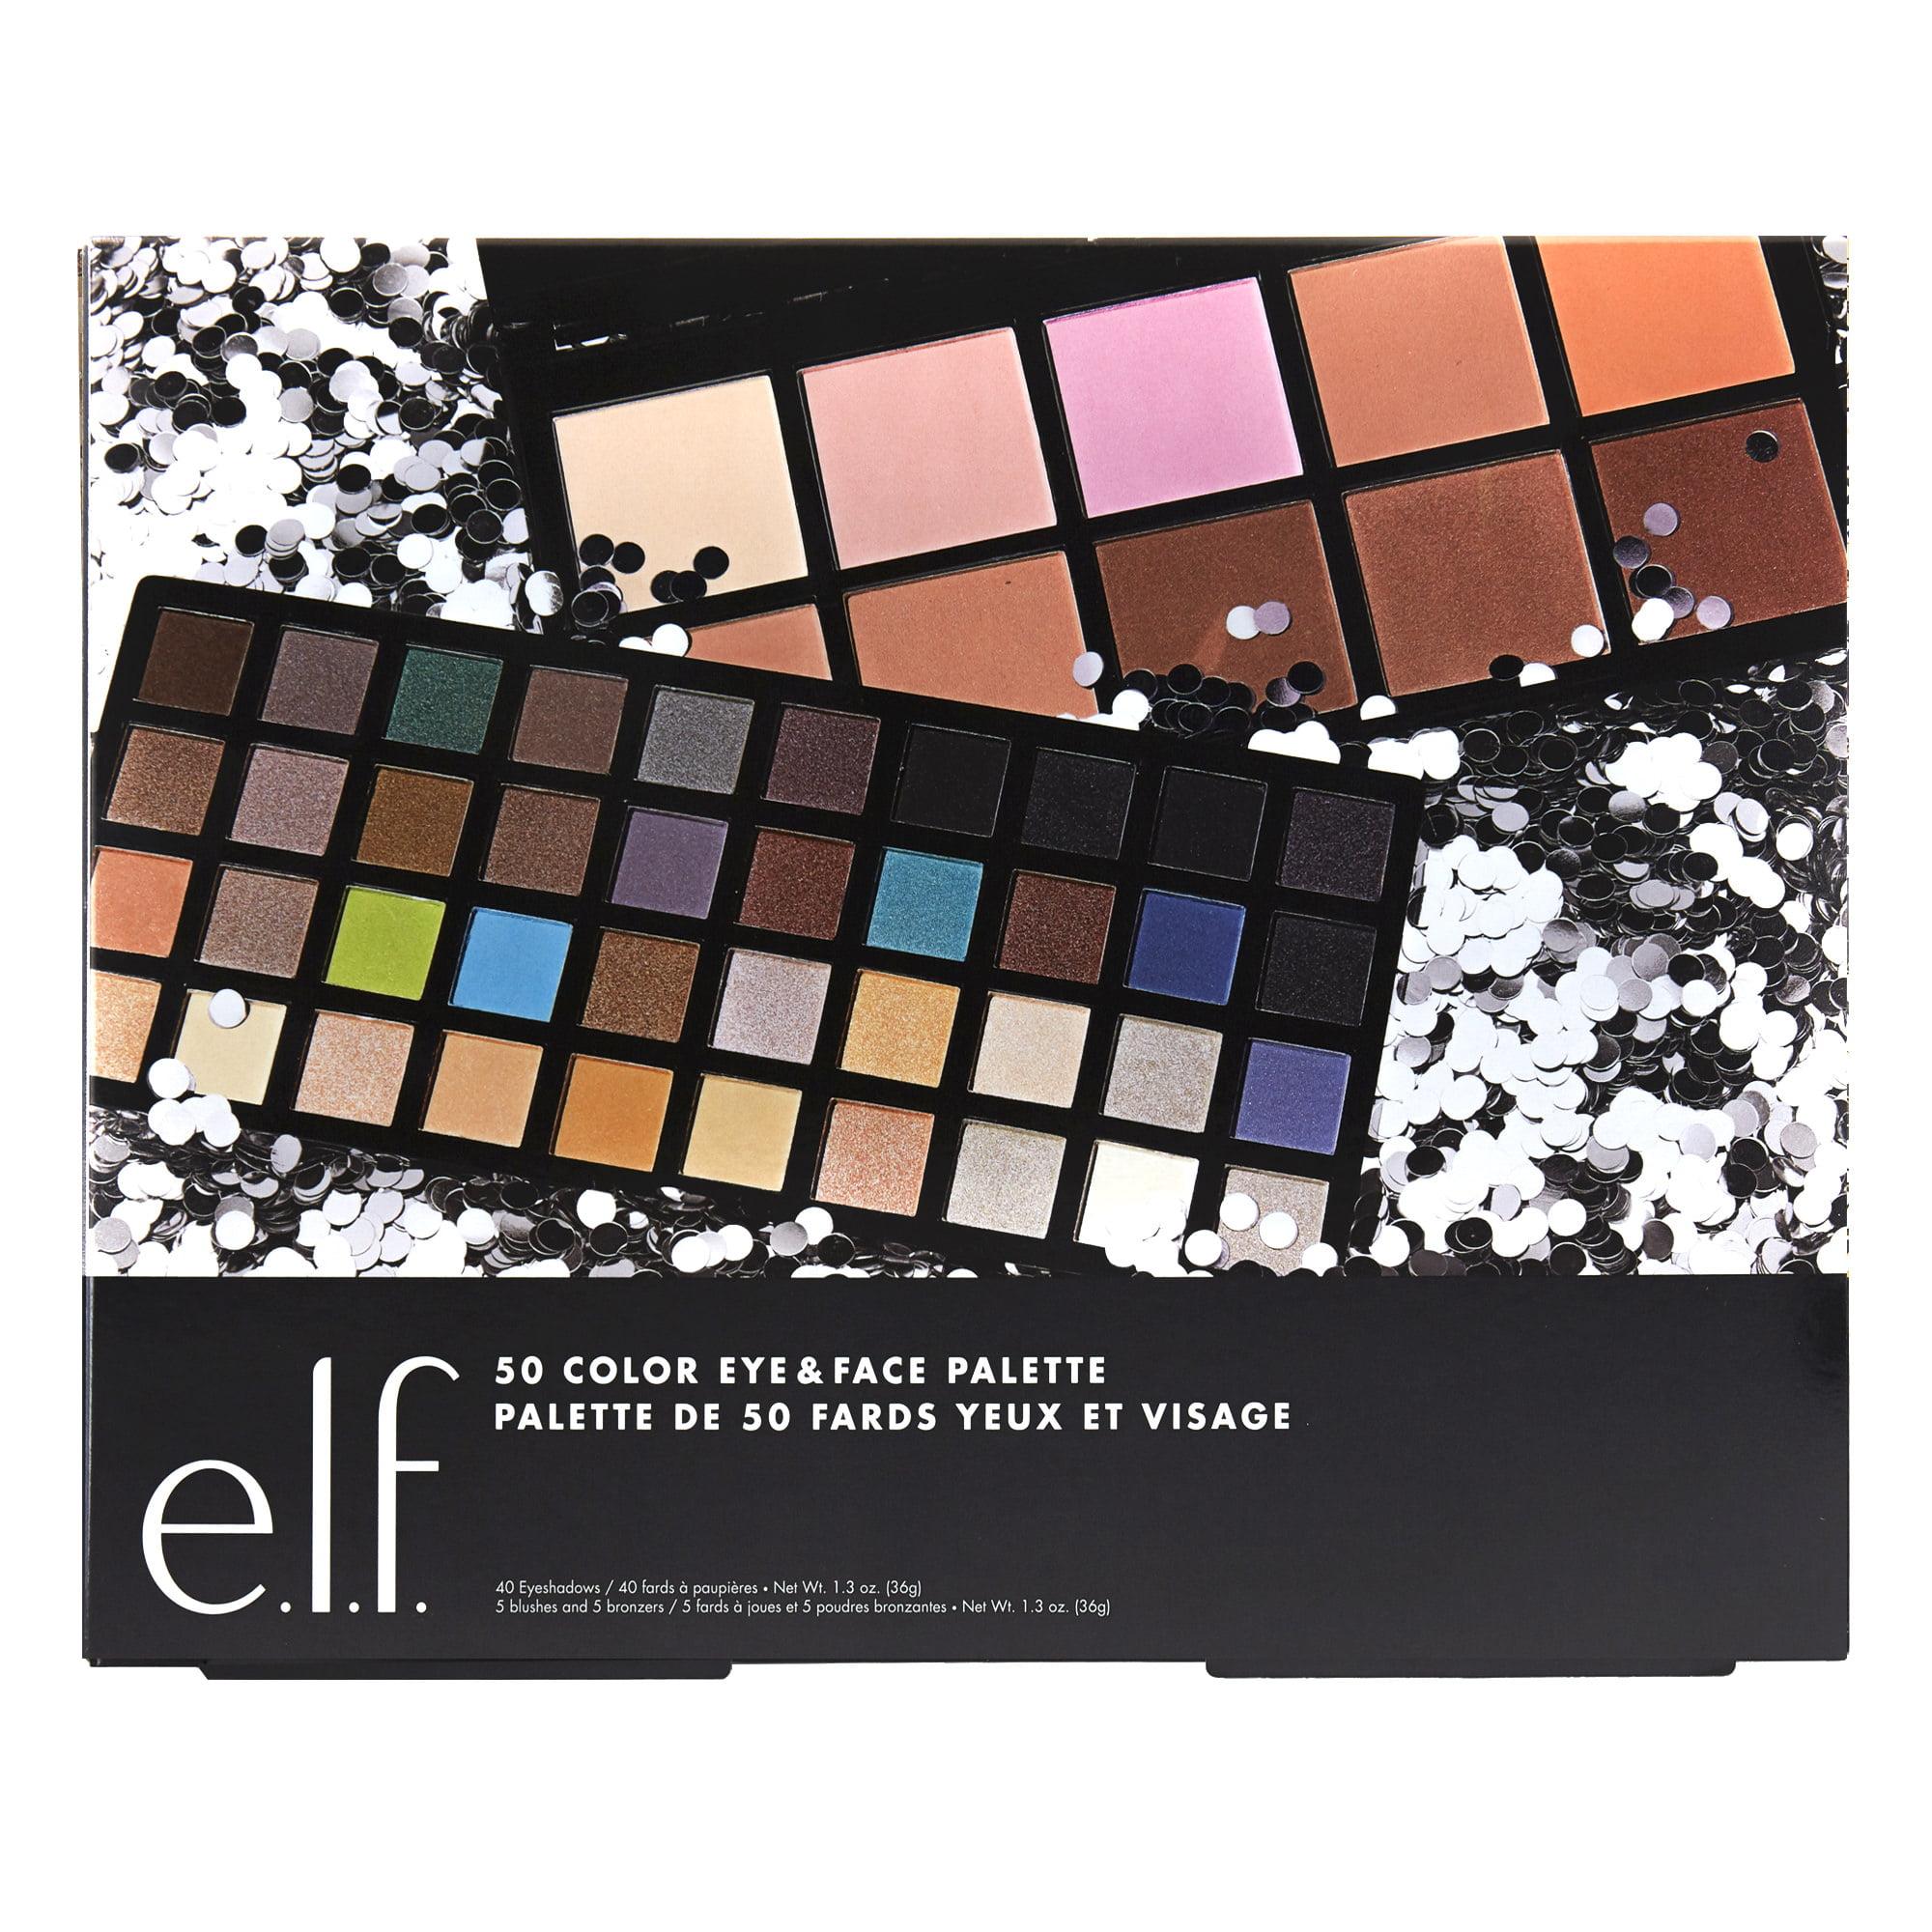 Makeup Focallure Glitter And Glow Liquid Eyeshadow